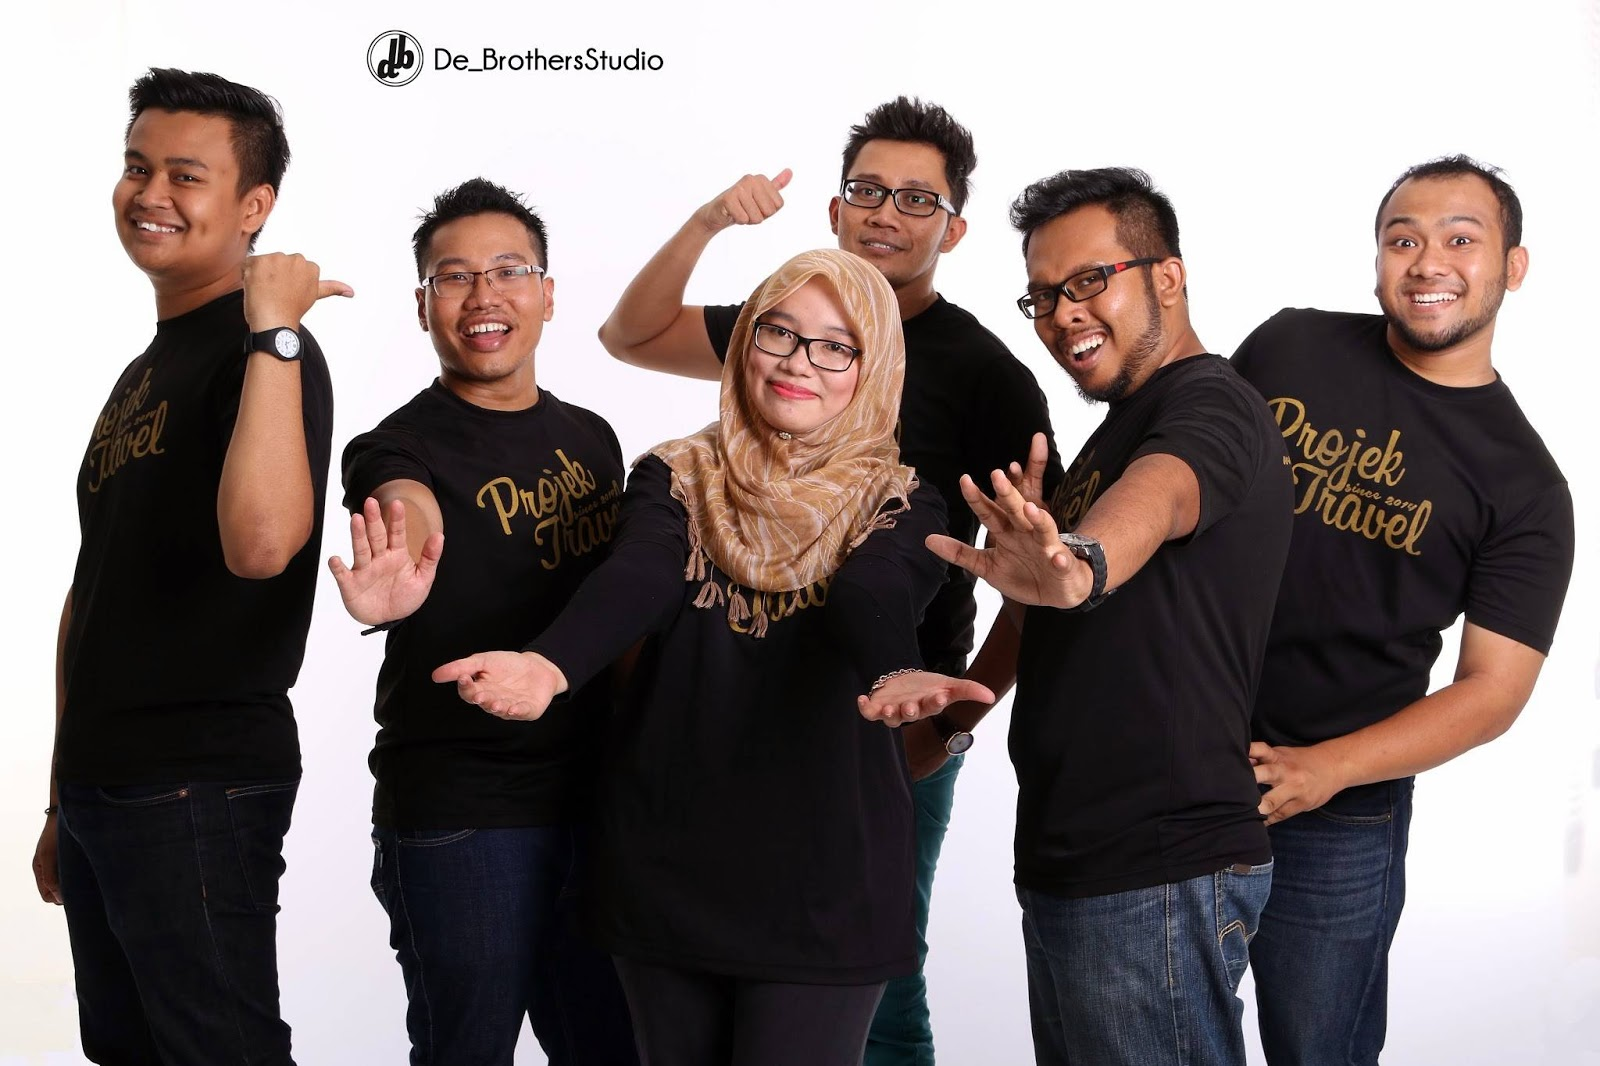 Projek Travel Team